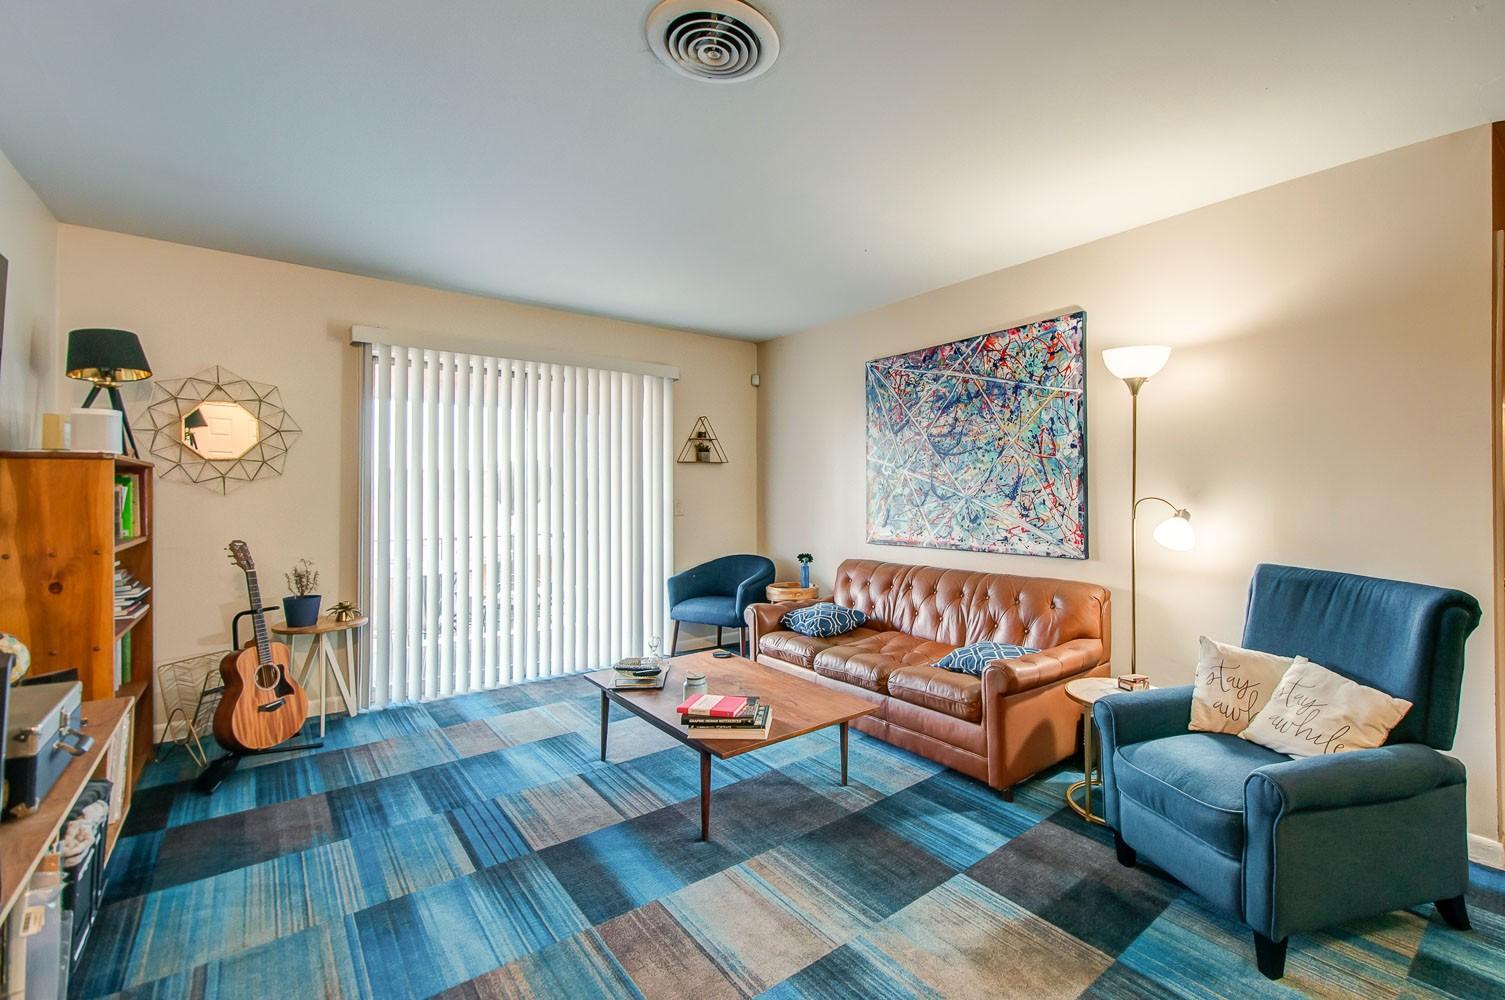 555 N DuPont Ave, Madison, TN 37115 - Madison, TN real estate listing